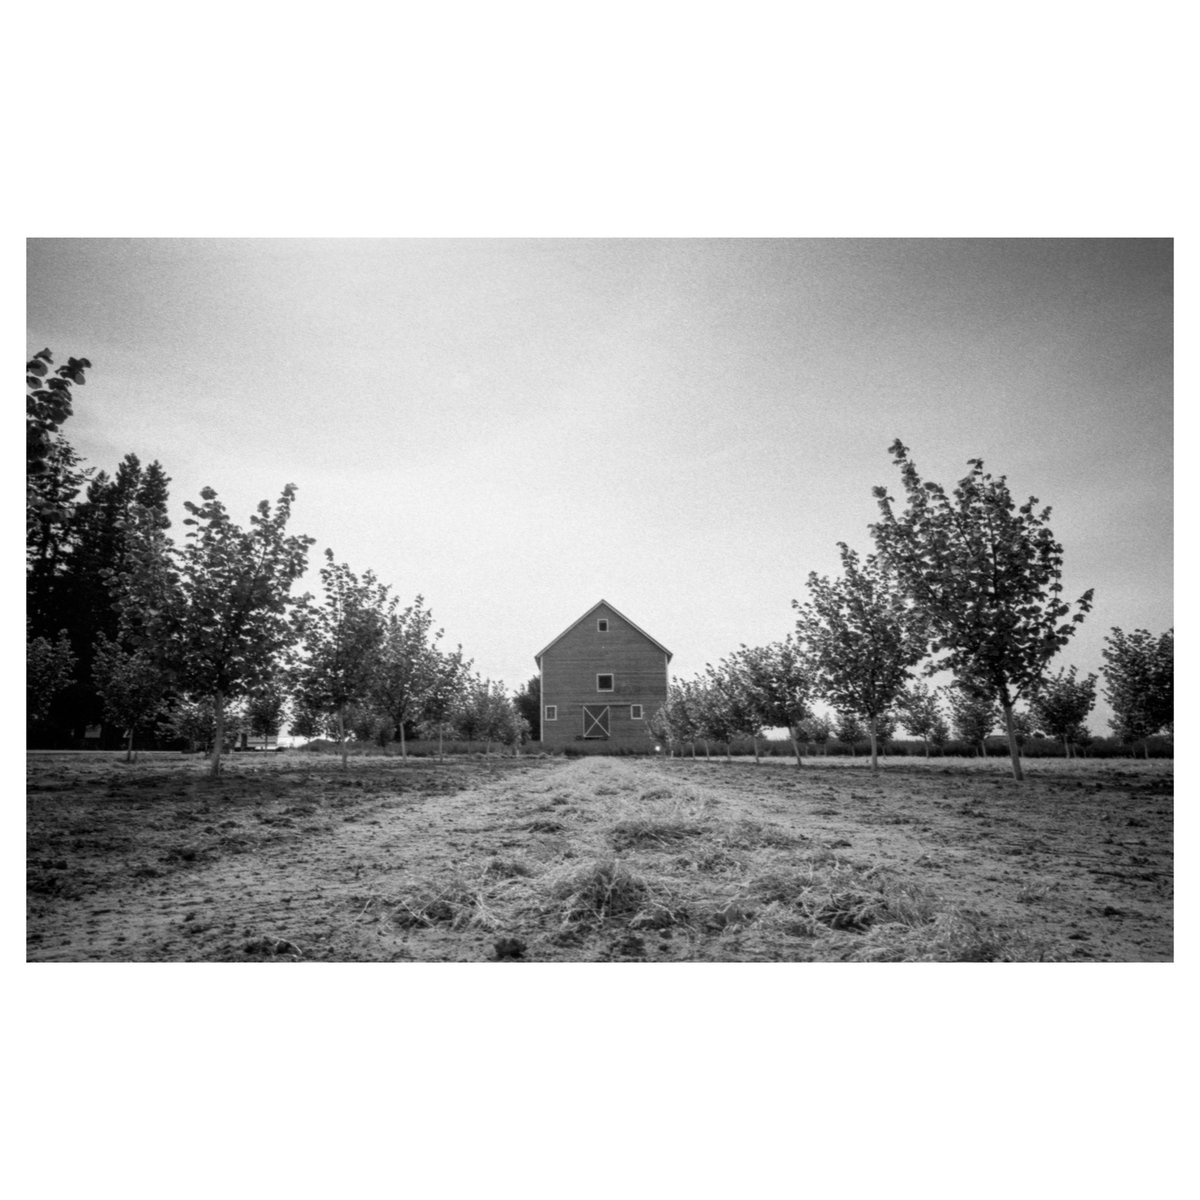 Oregon Wine Country during the Quar. #monochrome pic.twitter.com/K8eazuWbts